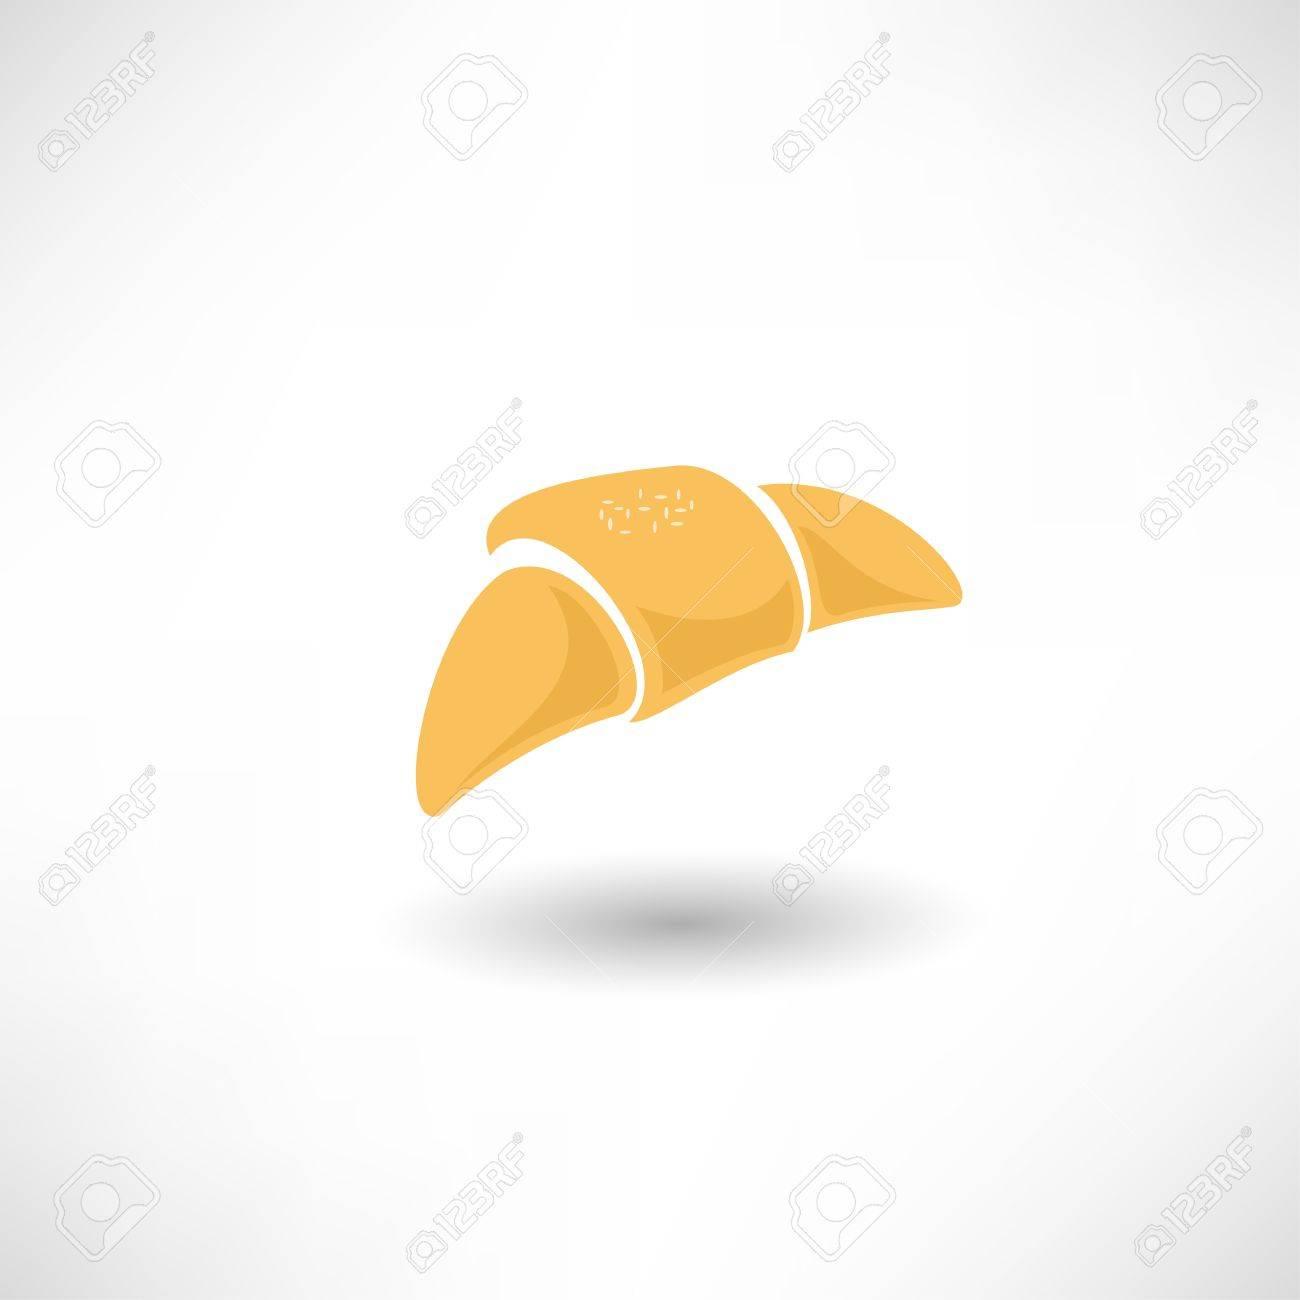 croissant Stock Vector - 17588380